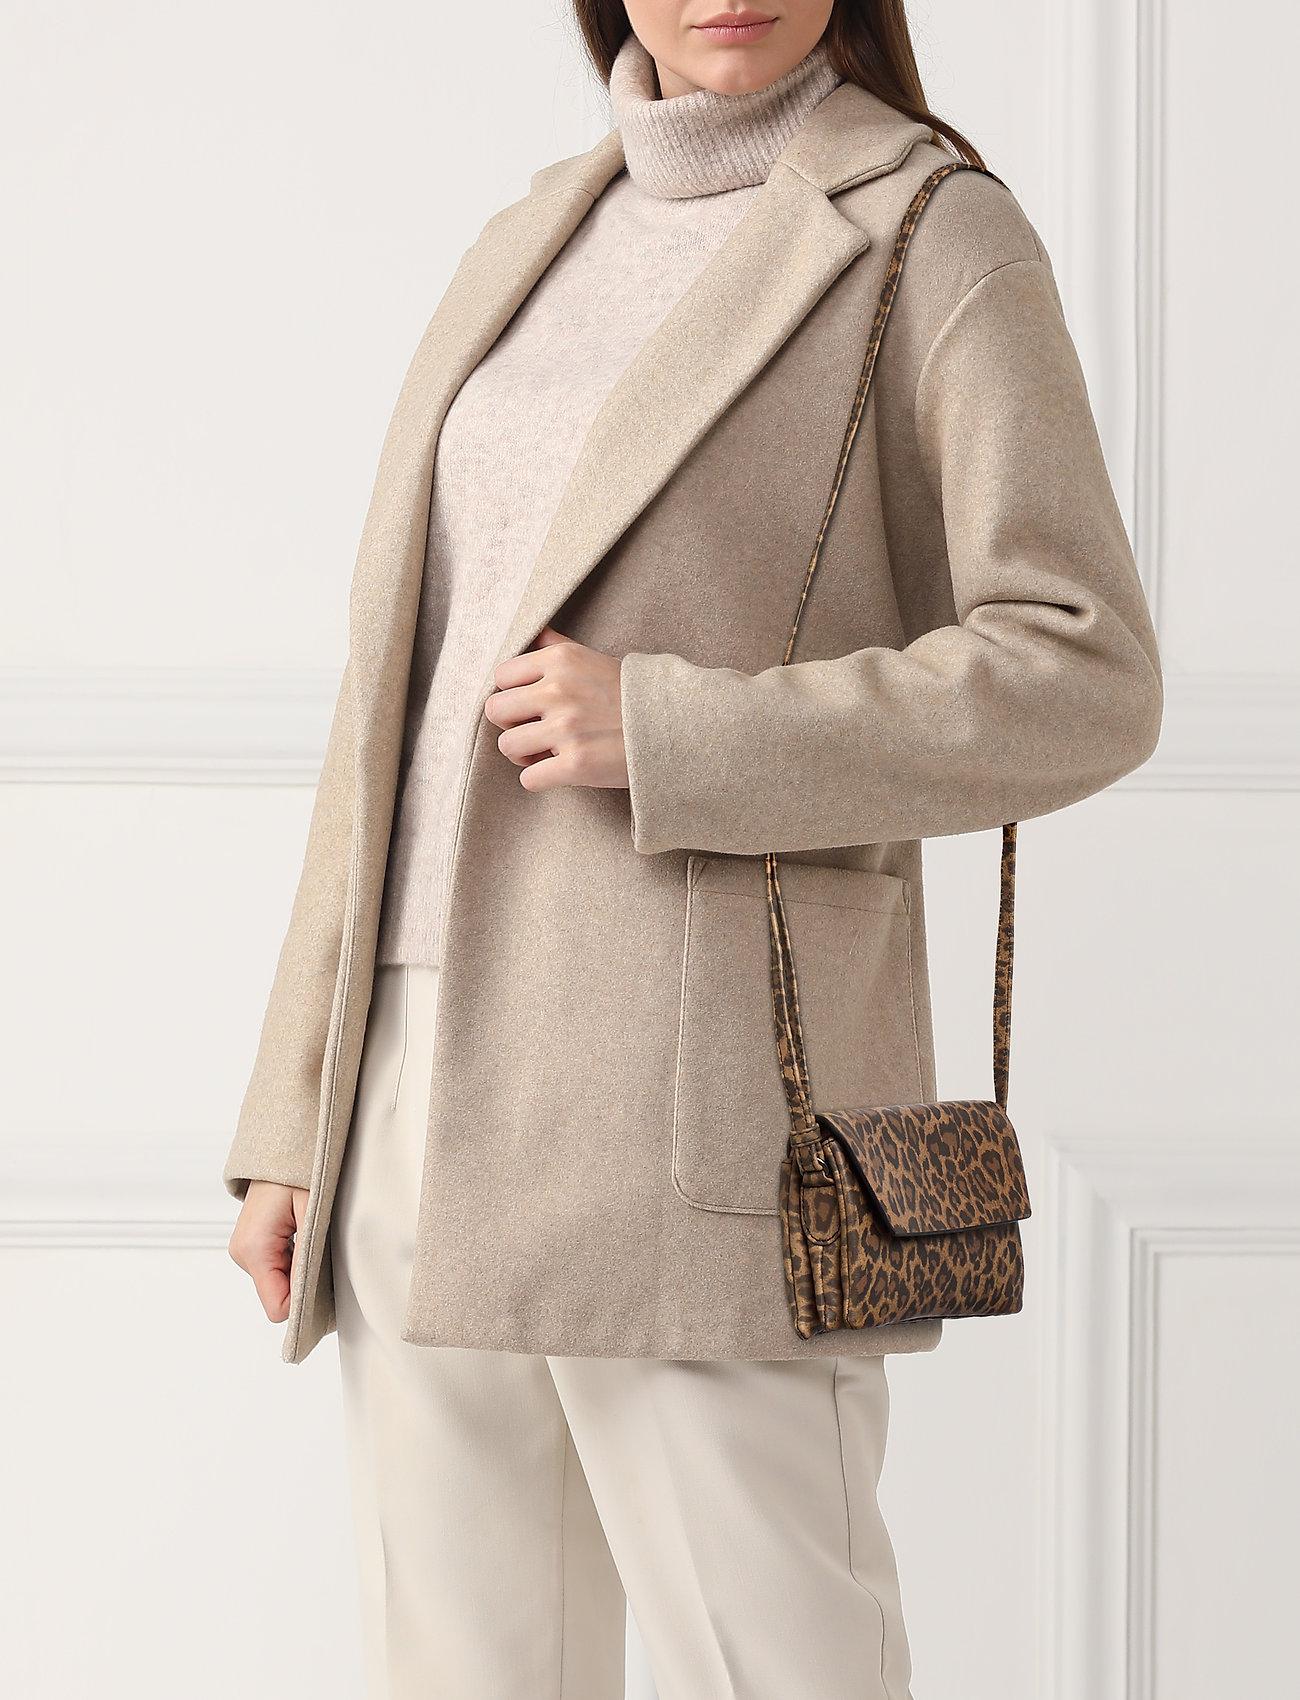 Markberg Rayna Crossbody Bag, Leopard - LEOPARD